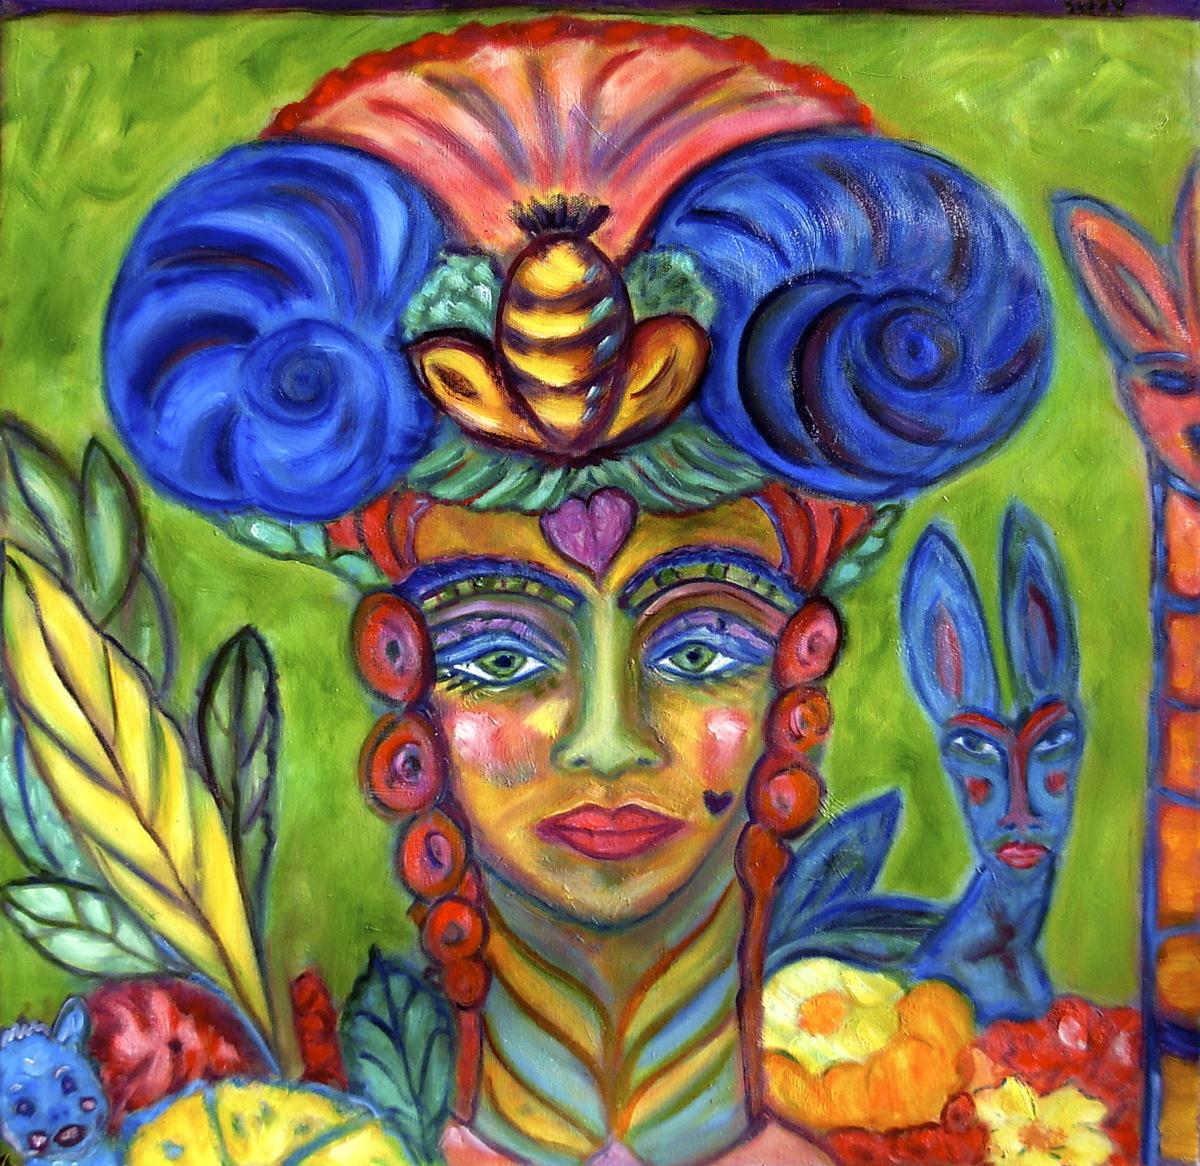 """Penticton Frida"" (large view)"